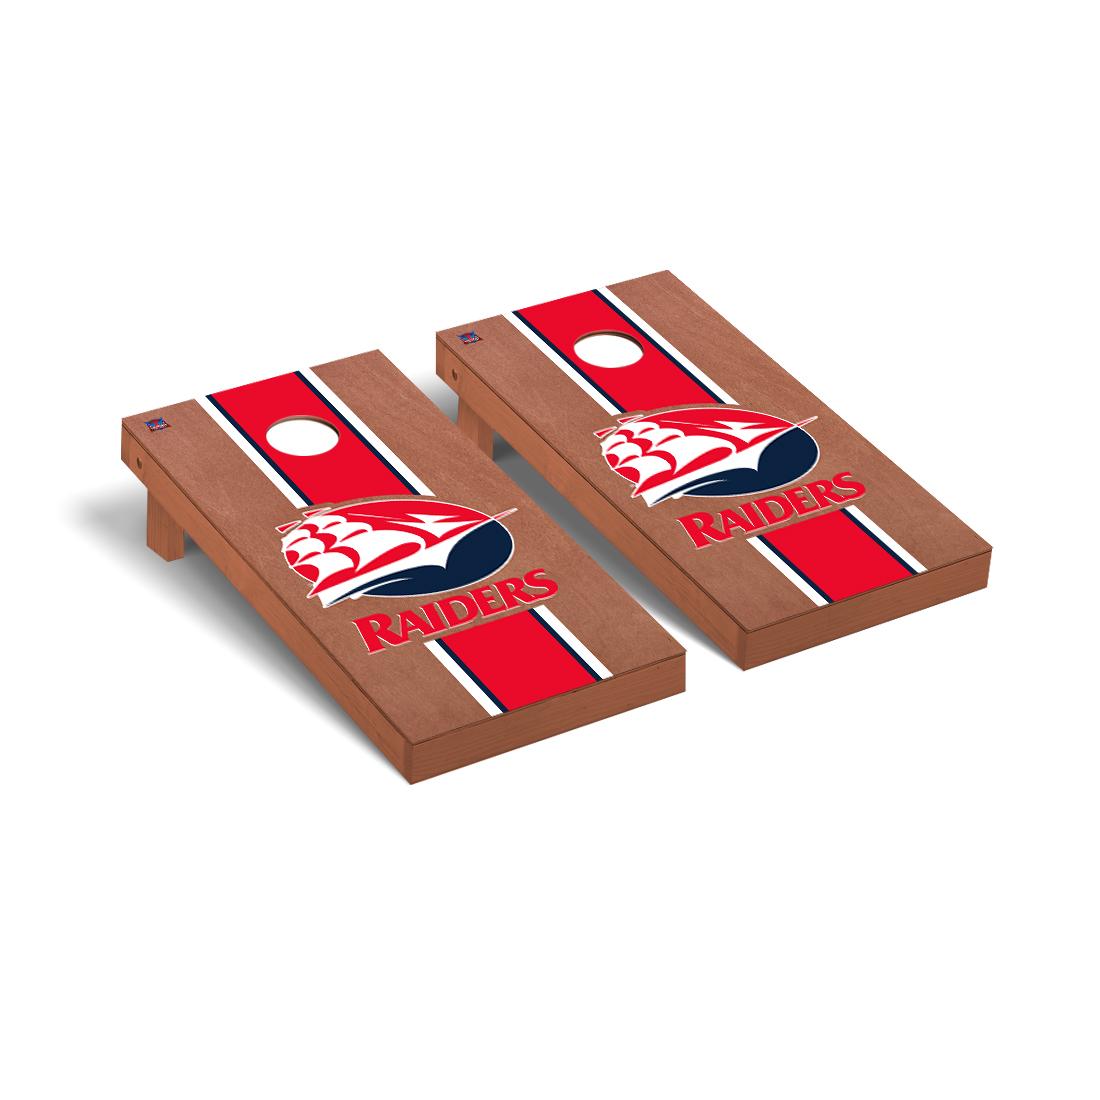 Shippensburg Red Raiders Cornhole Game Set Rosewood Stripe Version